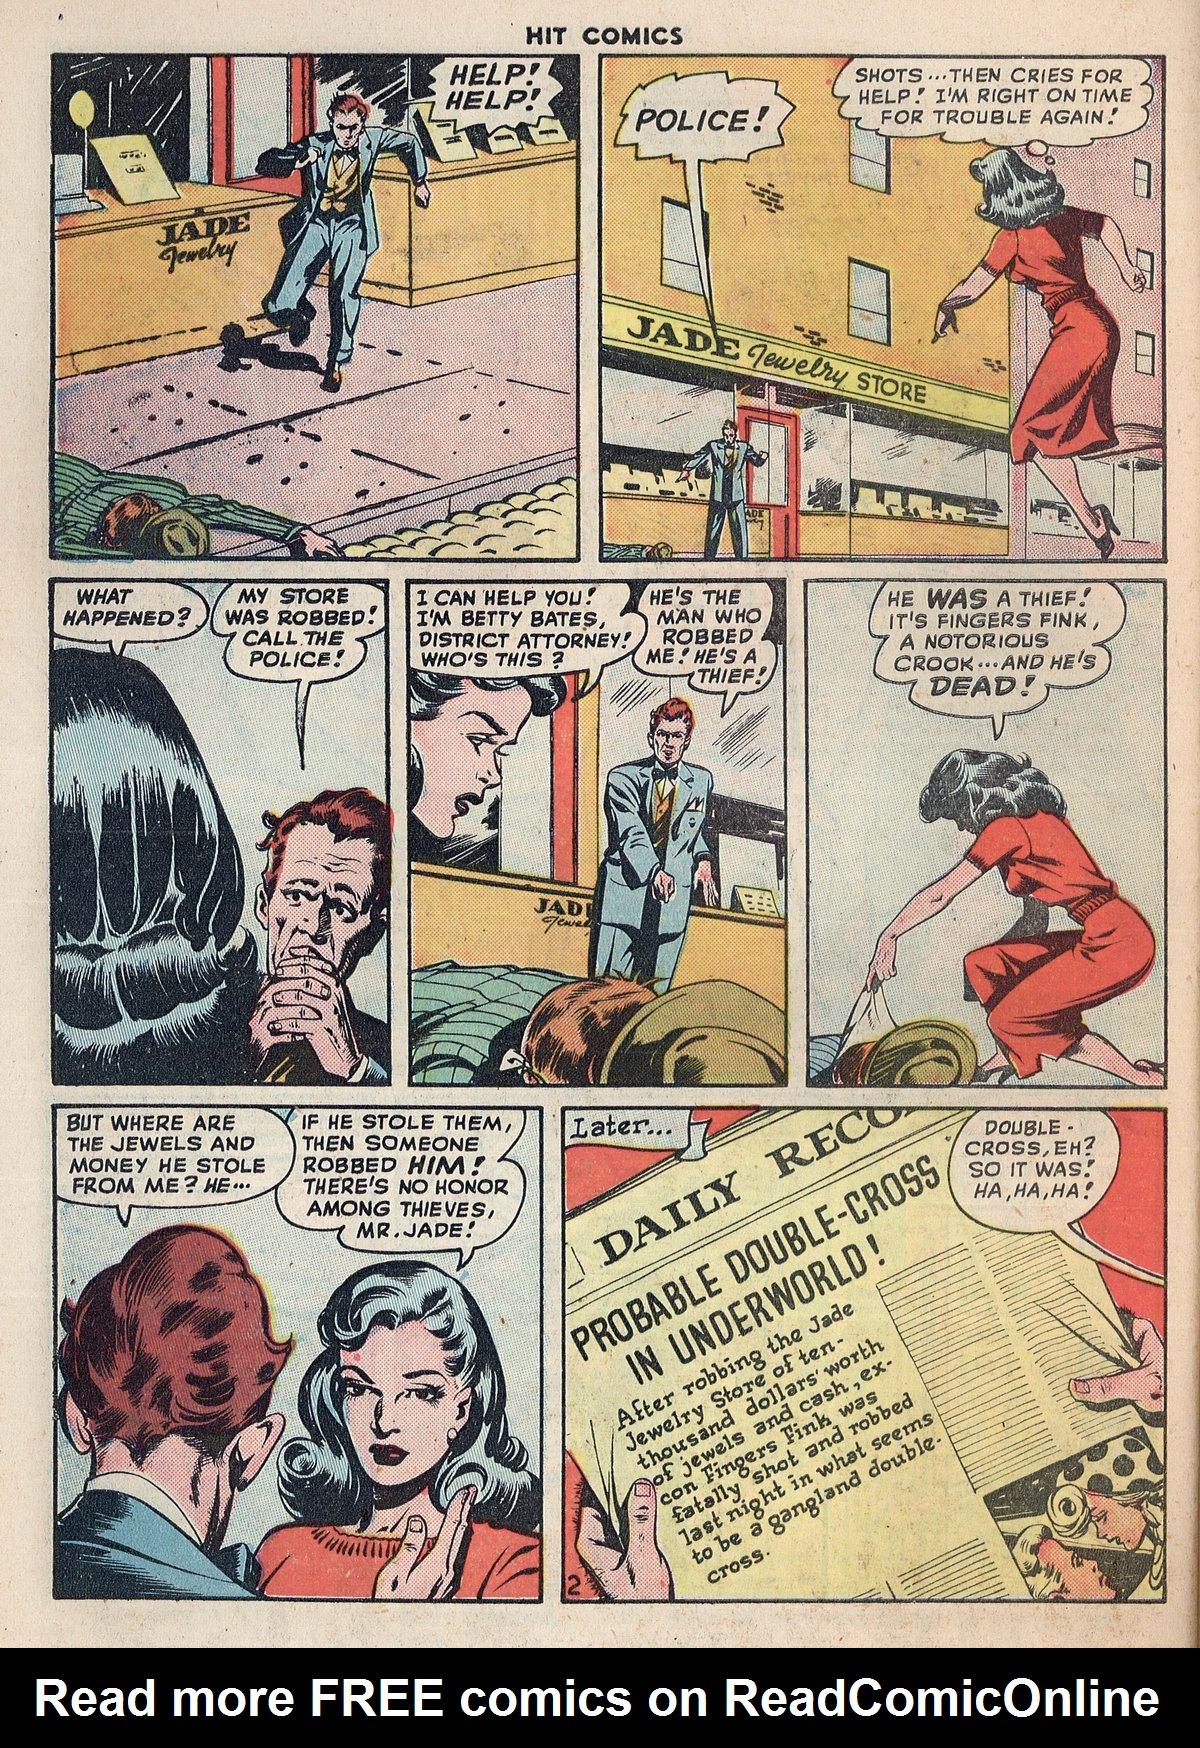 Read online Hit Comics comic -  Issue #55 - 40